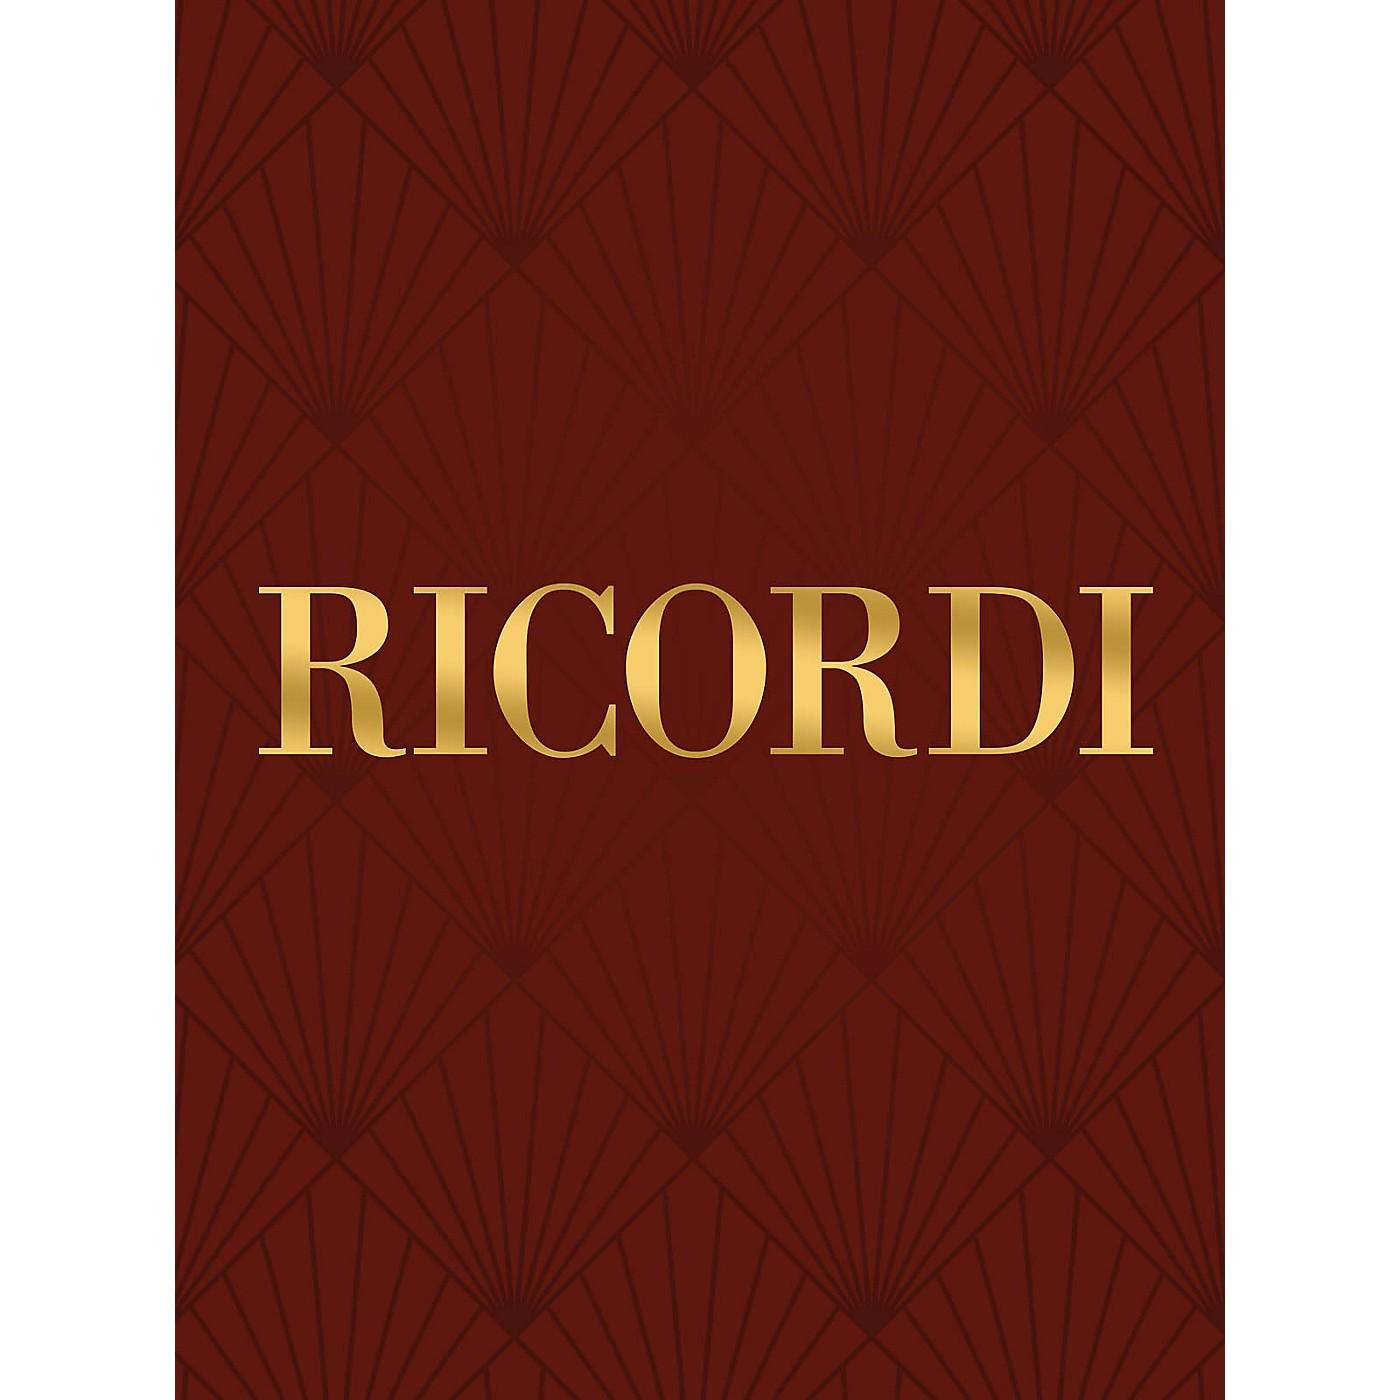 Ricordi Il Trovatore (Vocal Score) Vocal Score Series Composed by Giuseppe Verdi Edited by Charles Jefferys thumbnail